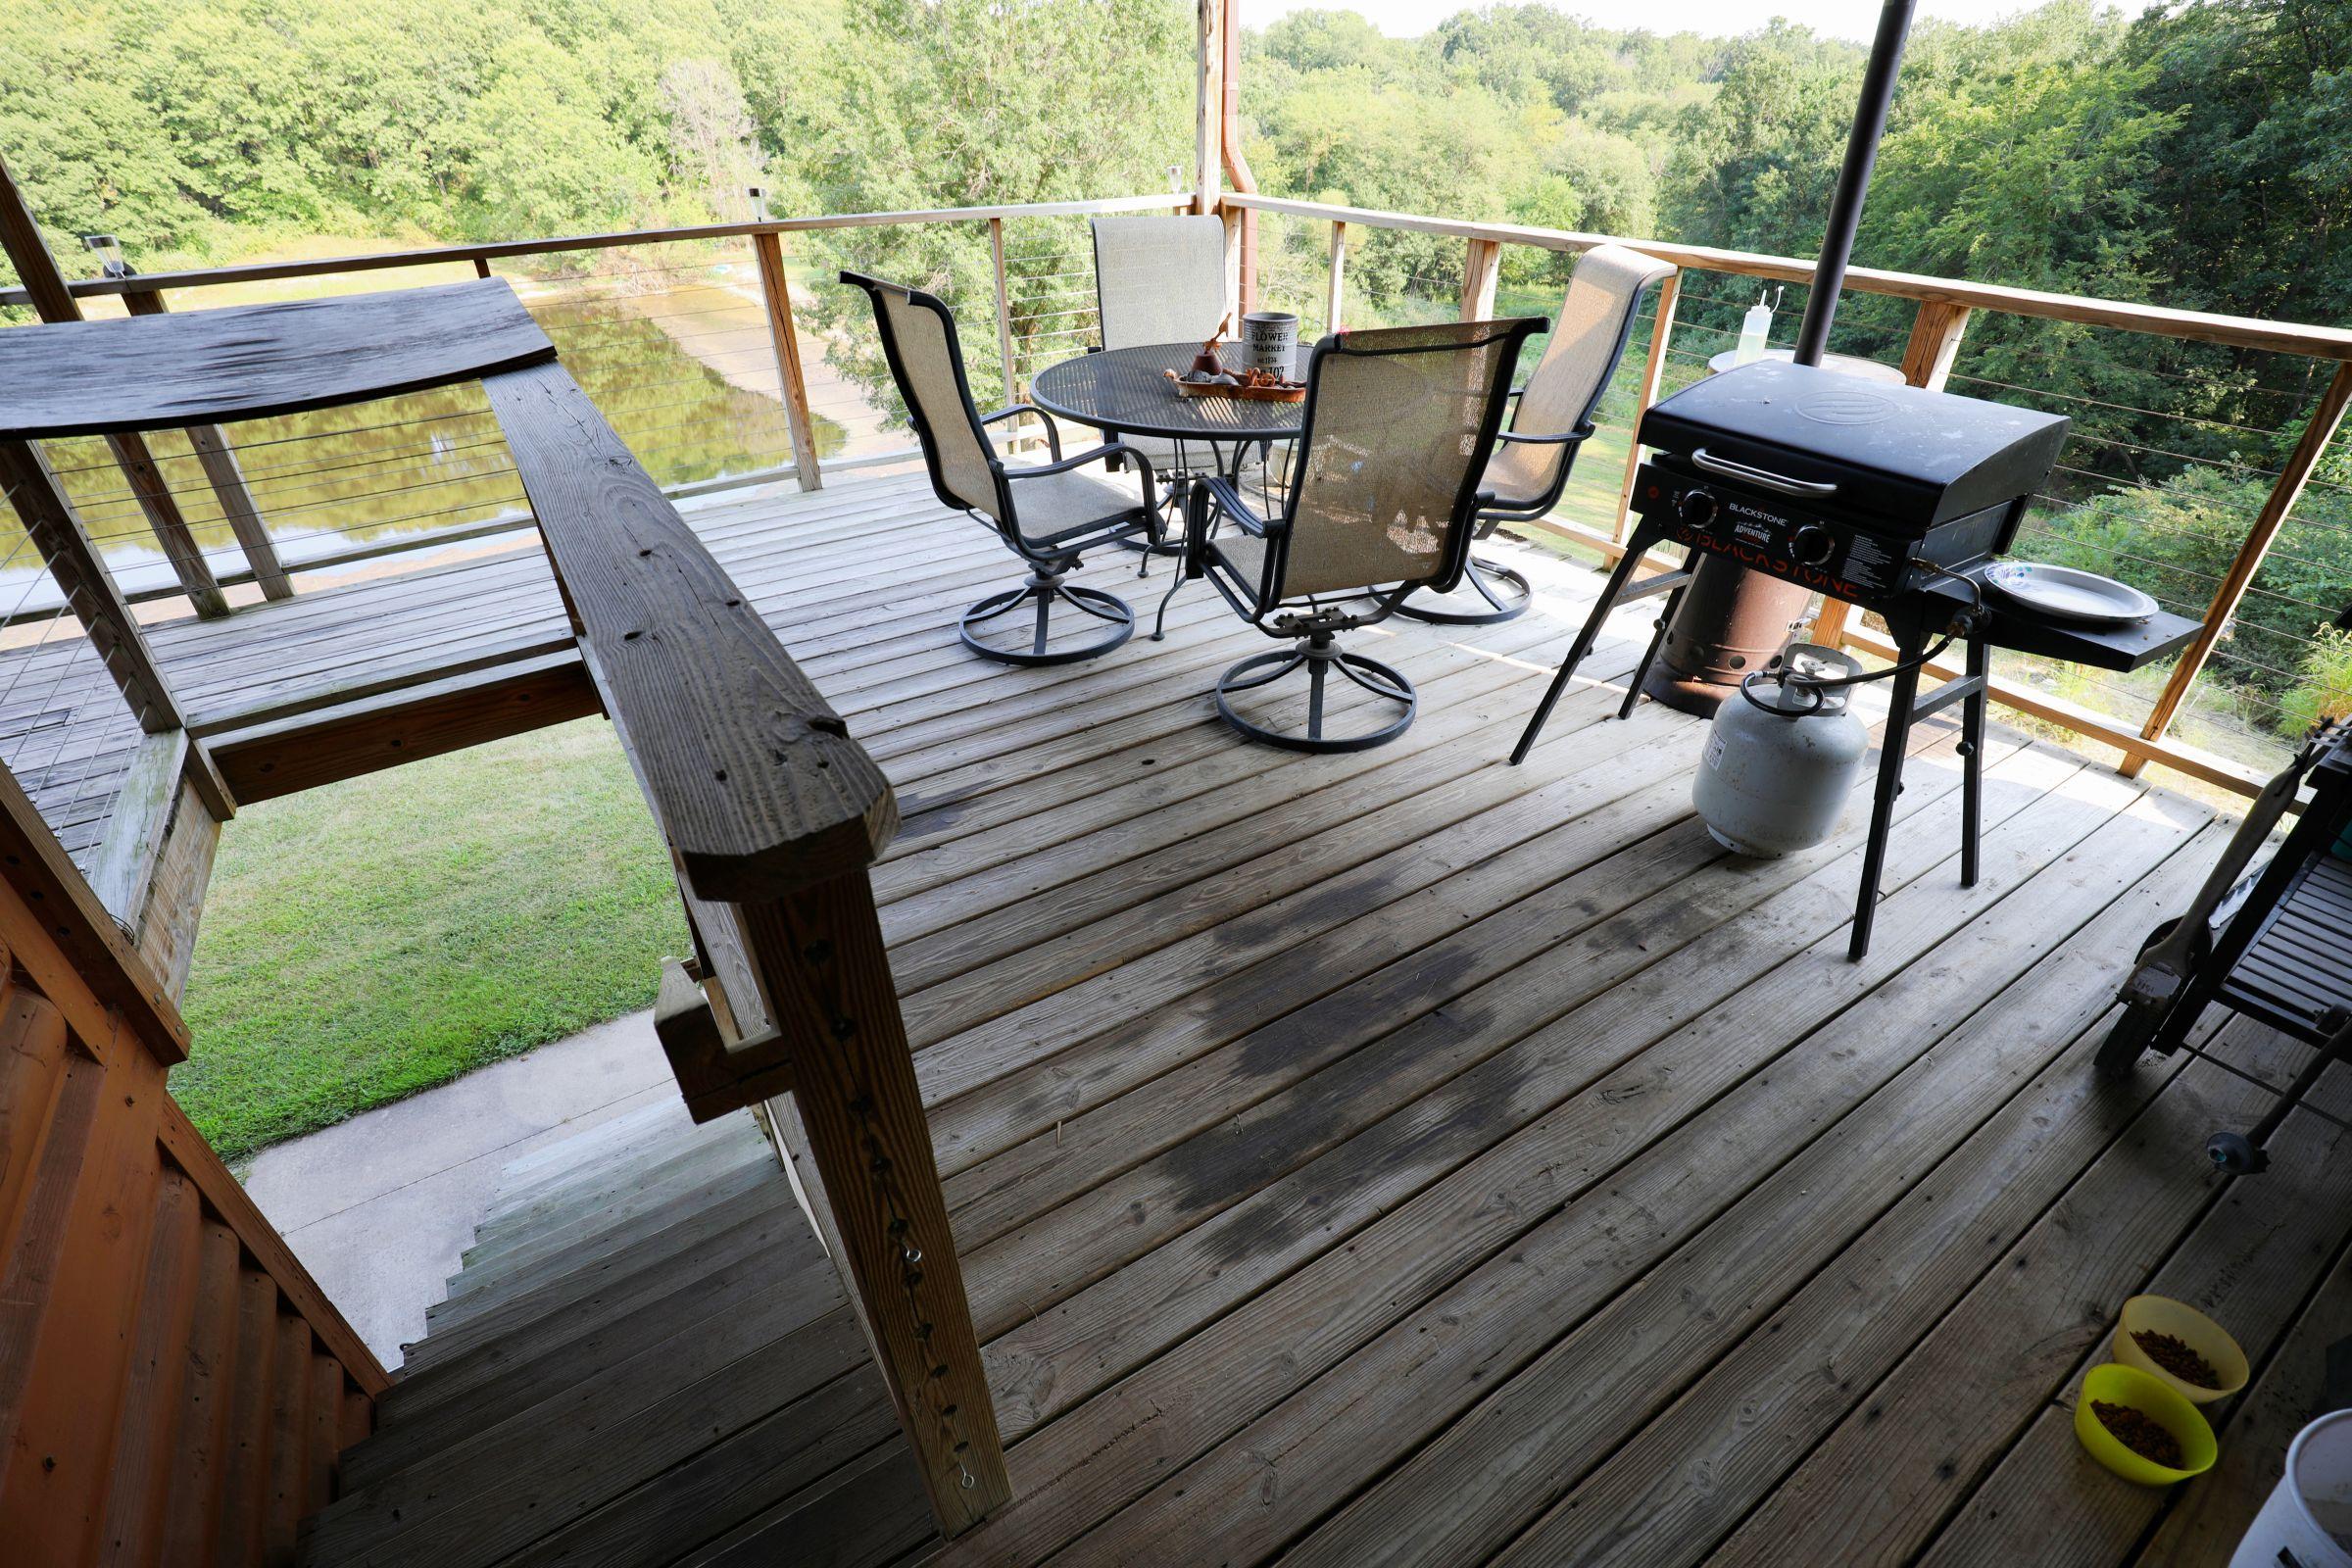 land-lee-county-iowa-328-acres-listing-number-15137-1-2020-08-27-174650.jpg